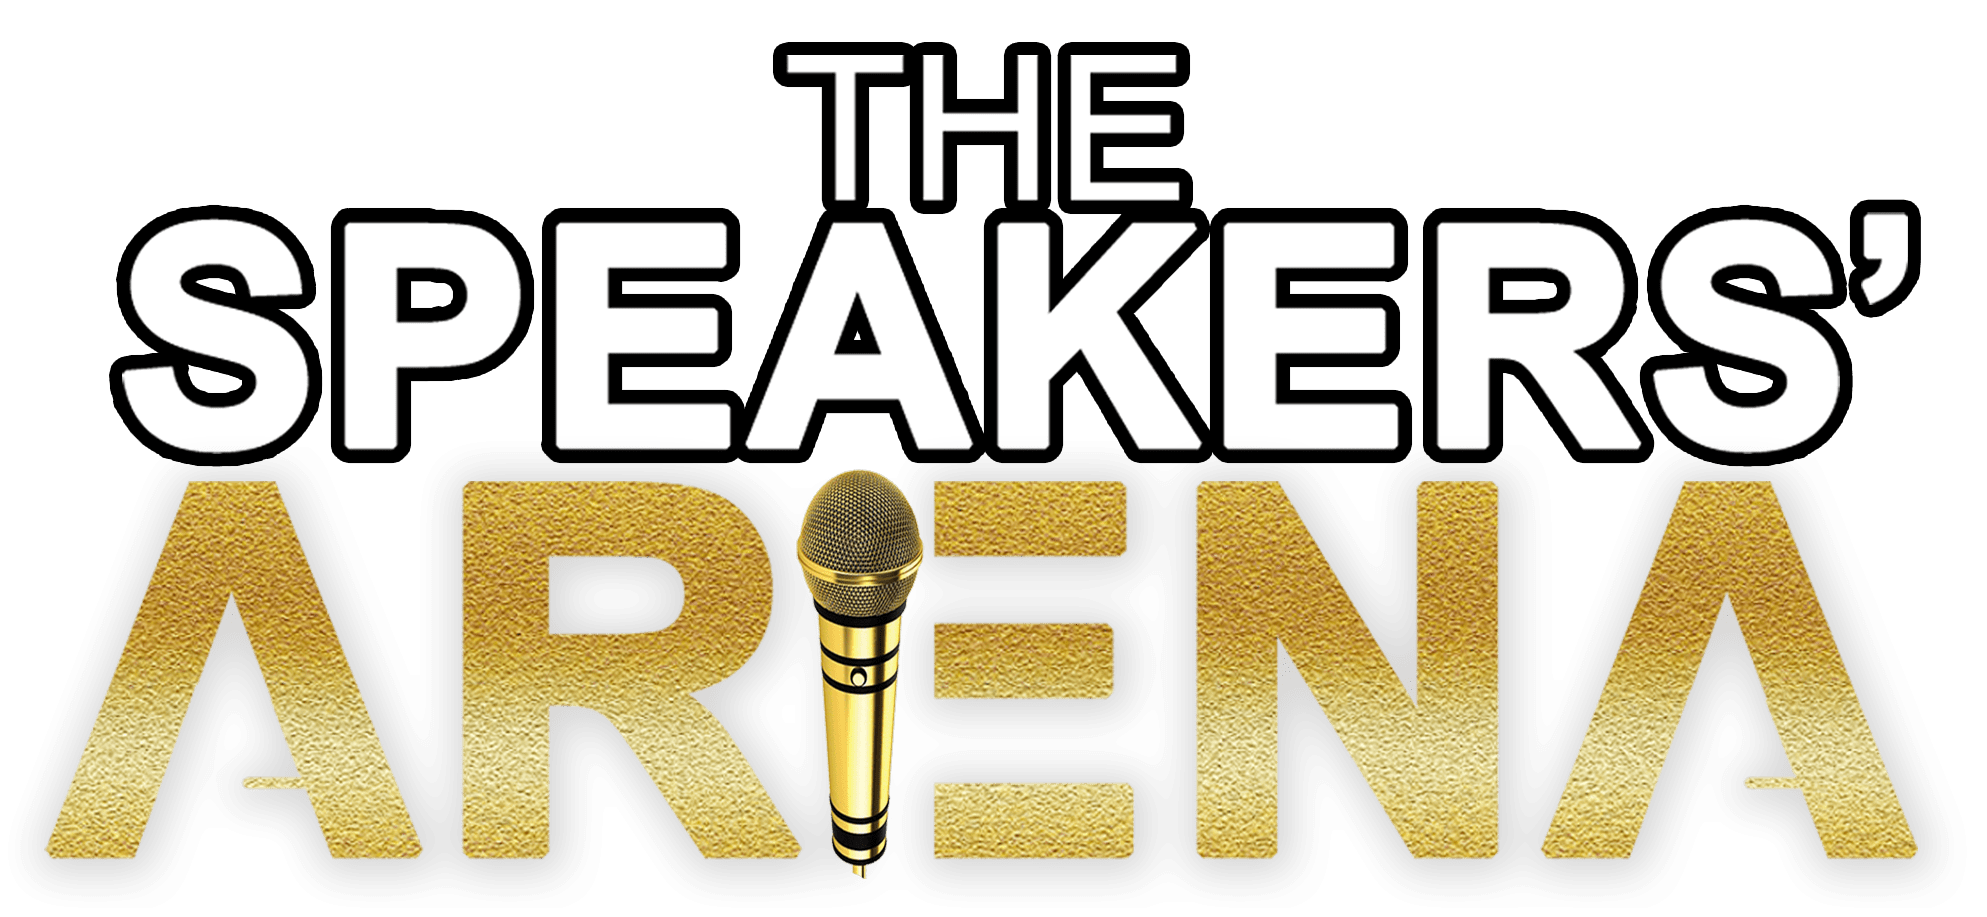 The speakers' Arena